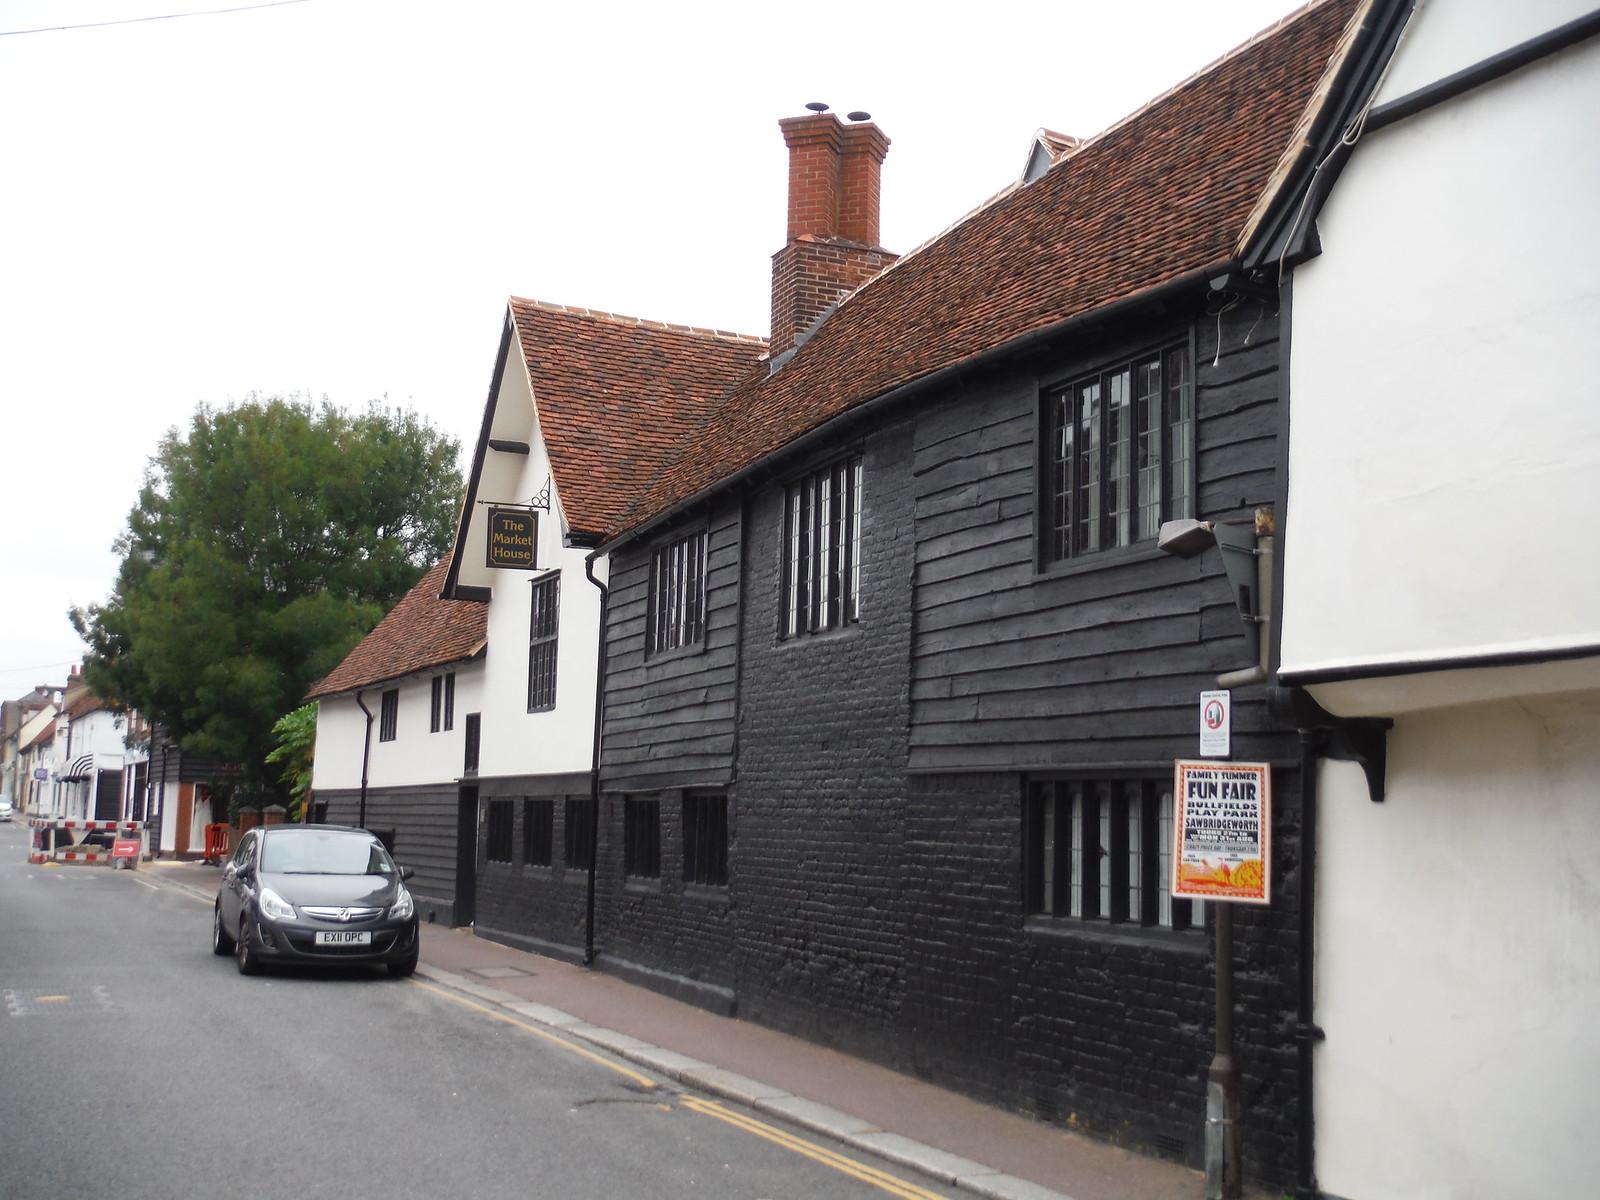 House in Sawbridgeworth, Bell Street SWC Walk 164 Roydon to Sawbridgeworth via Henry Moore Foundation